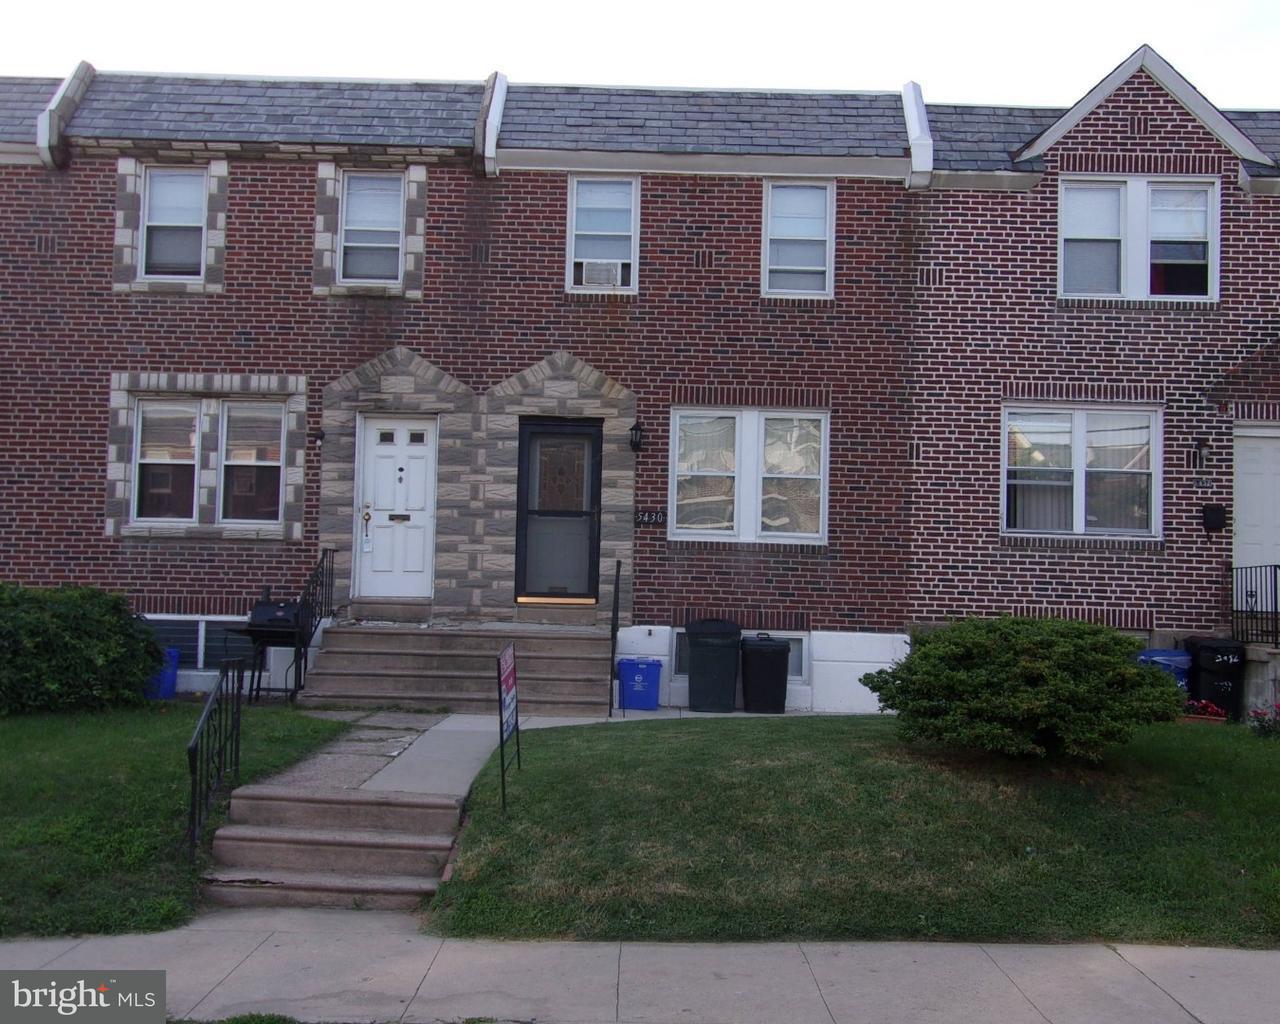 5430 Charles Street Philadelphia, PA 19124